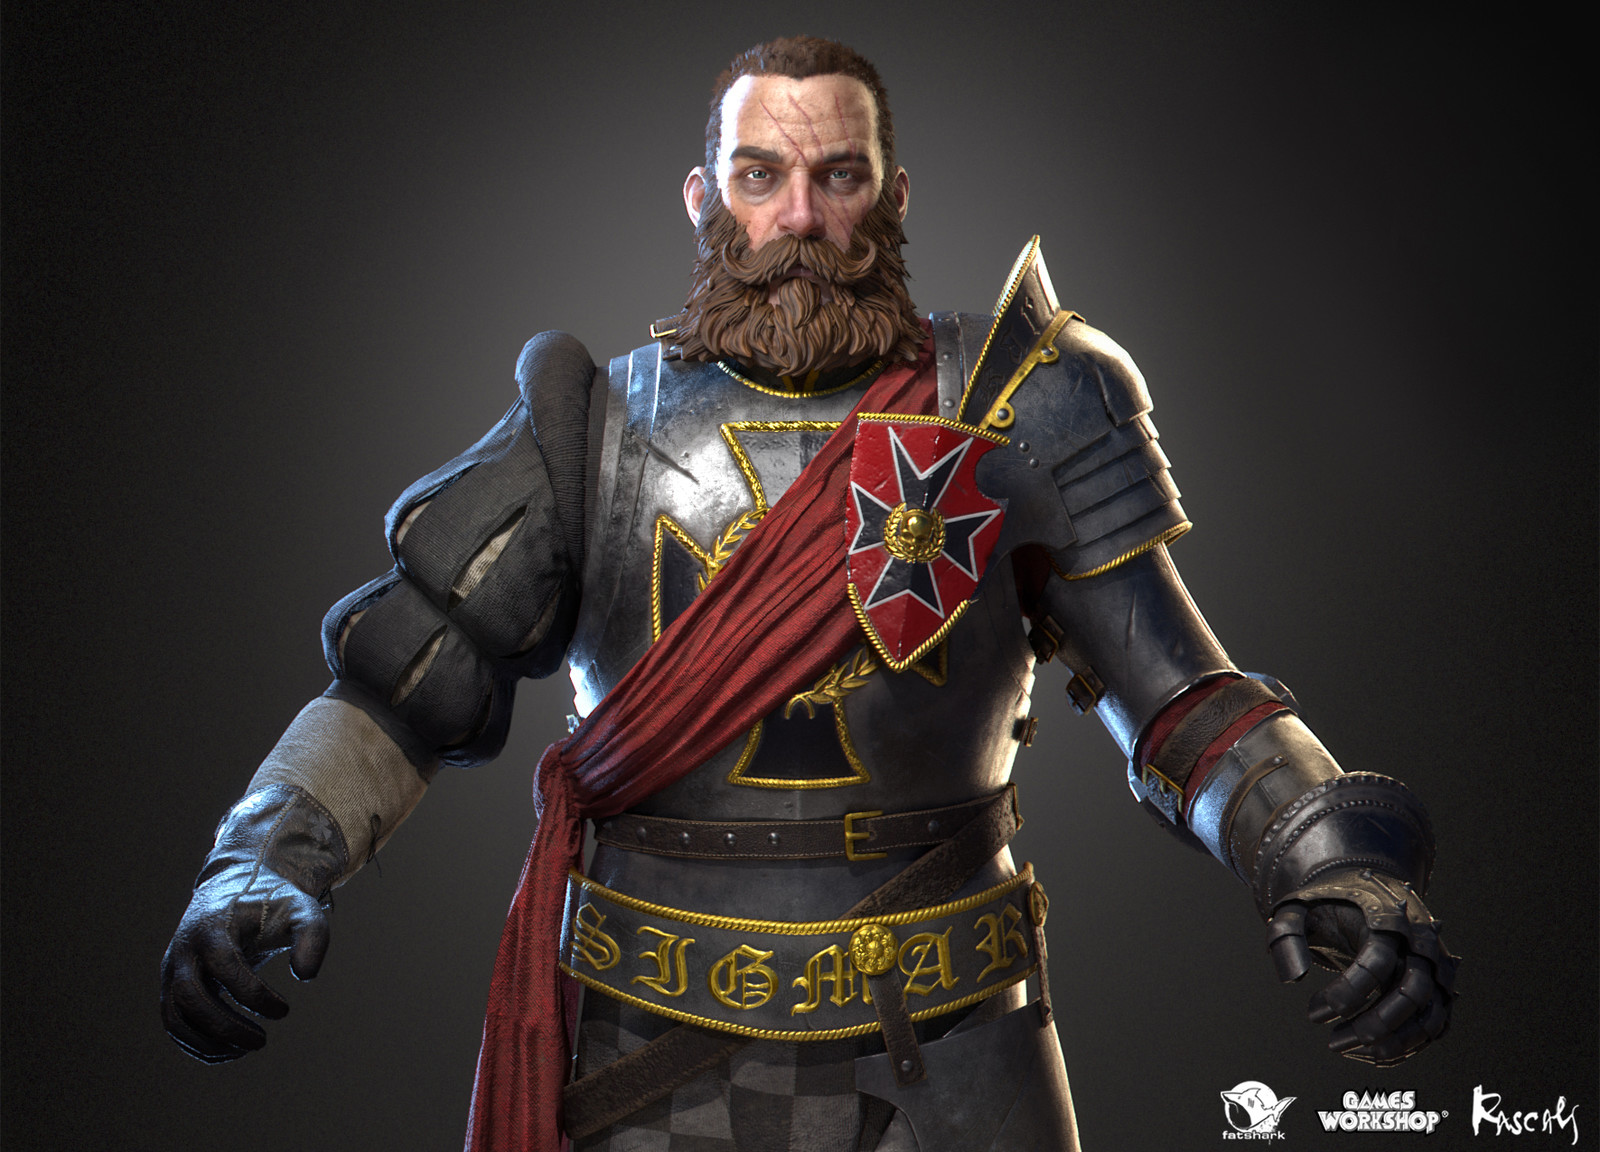 Markus Kruber: Mercenary is one of the playable hero variants Rascals made for Warhammer: Vermintide II, Fatshark's award-winning co-op meelee action published by Games Workshop.